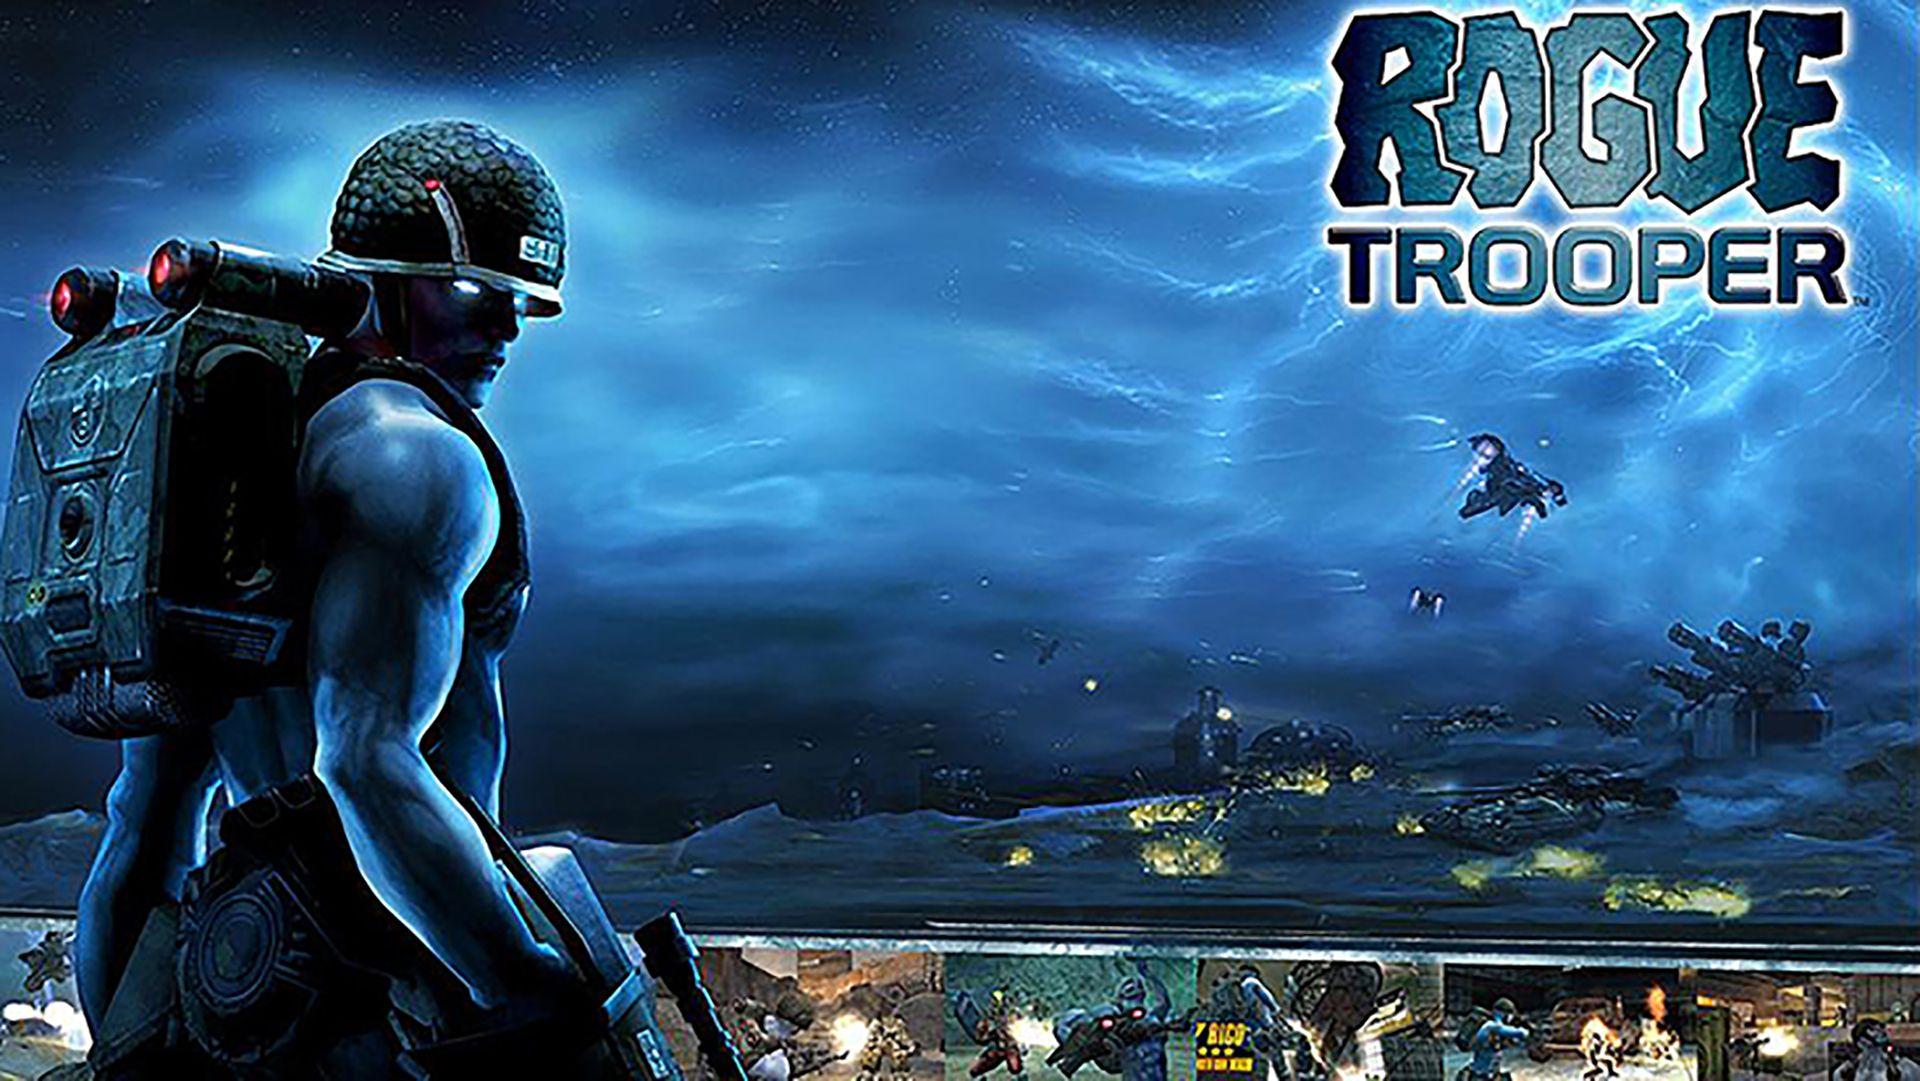 Image result for 2000 ad comics rogue trooper Trooper